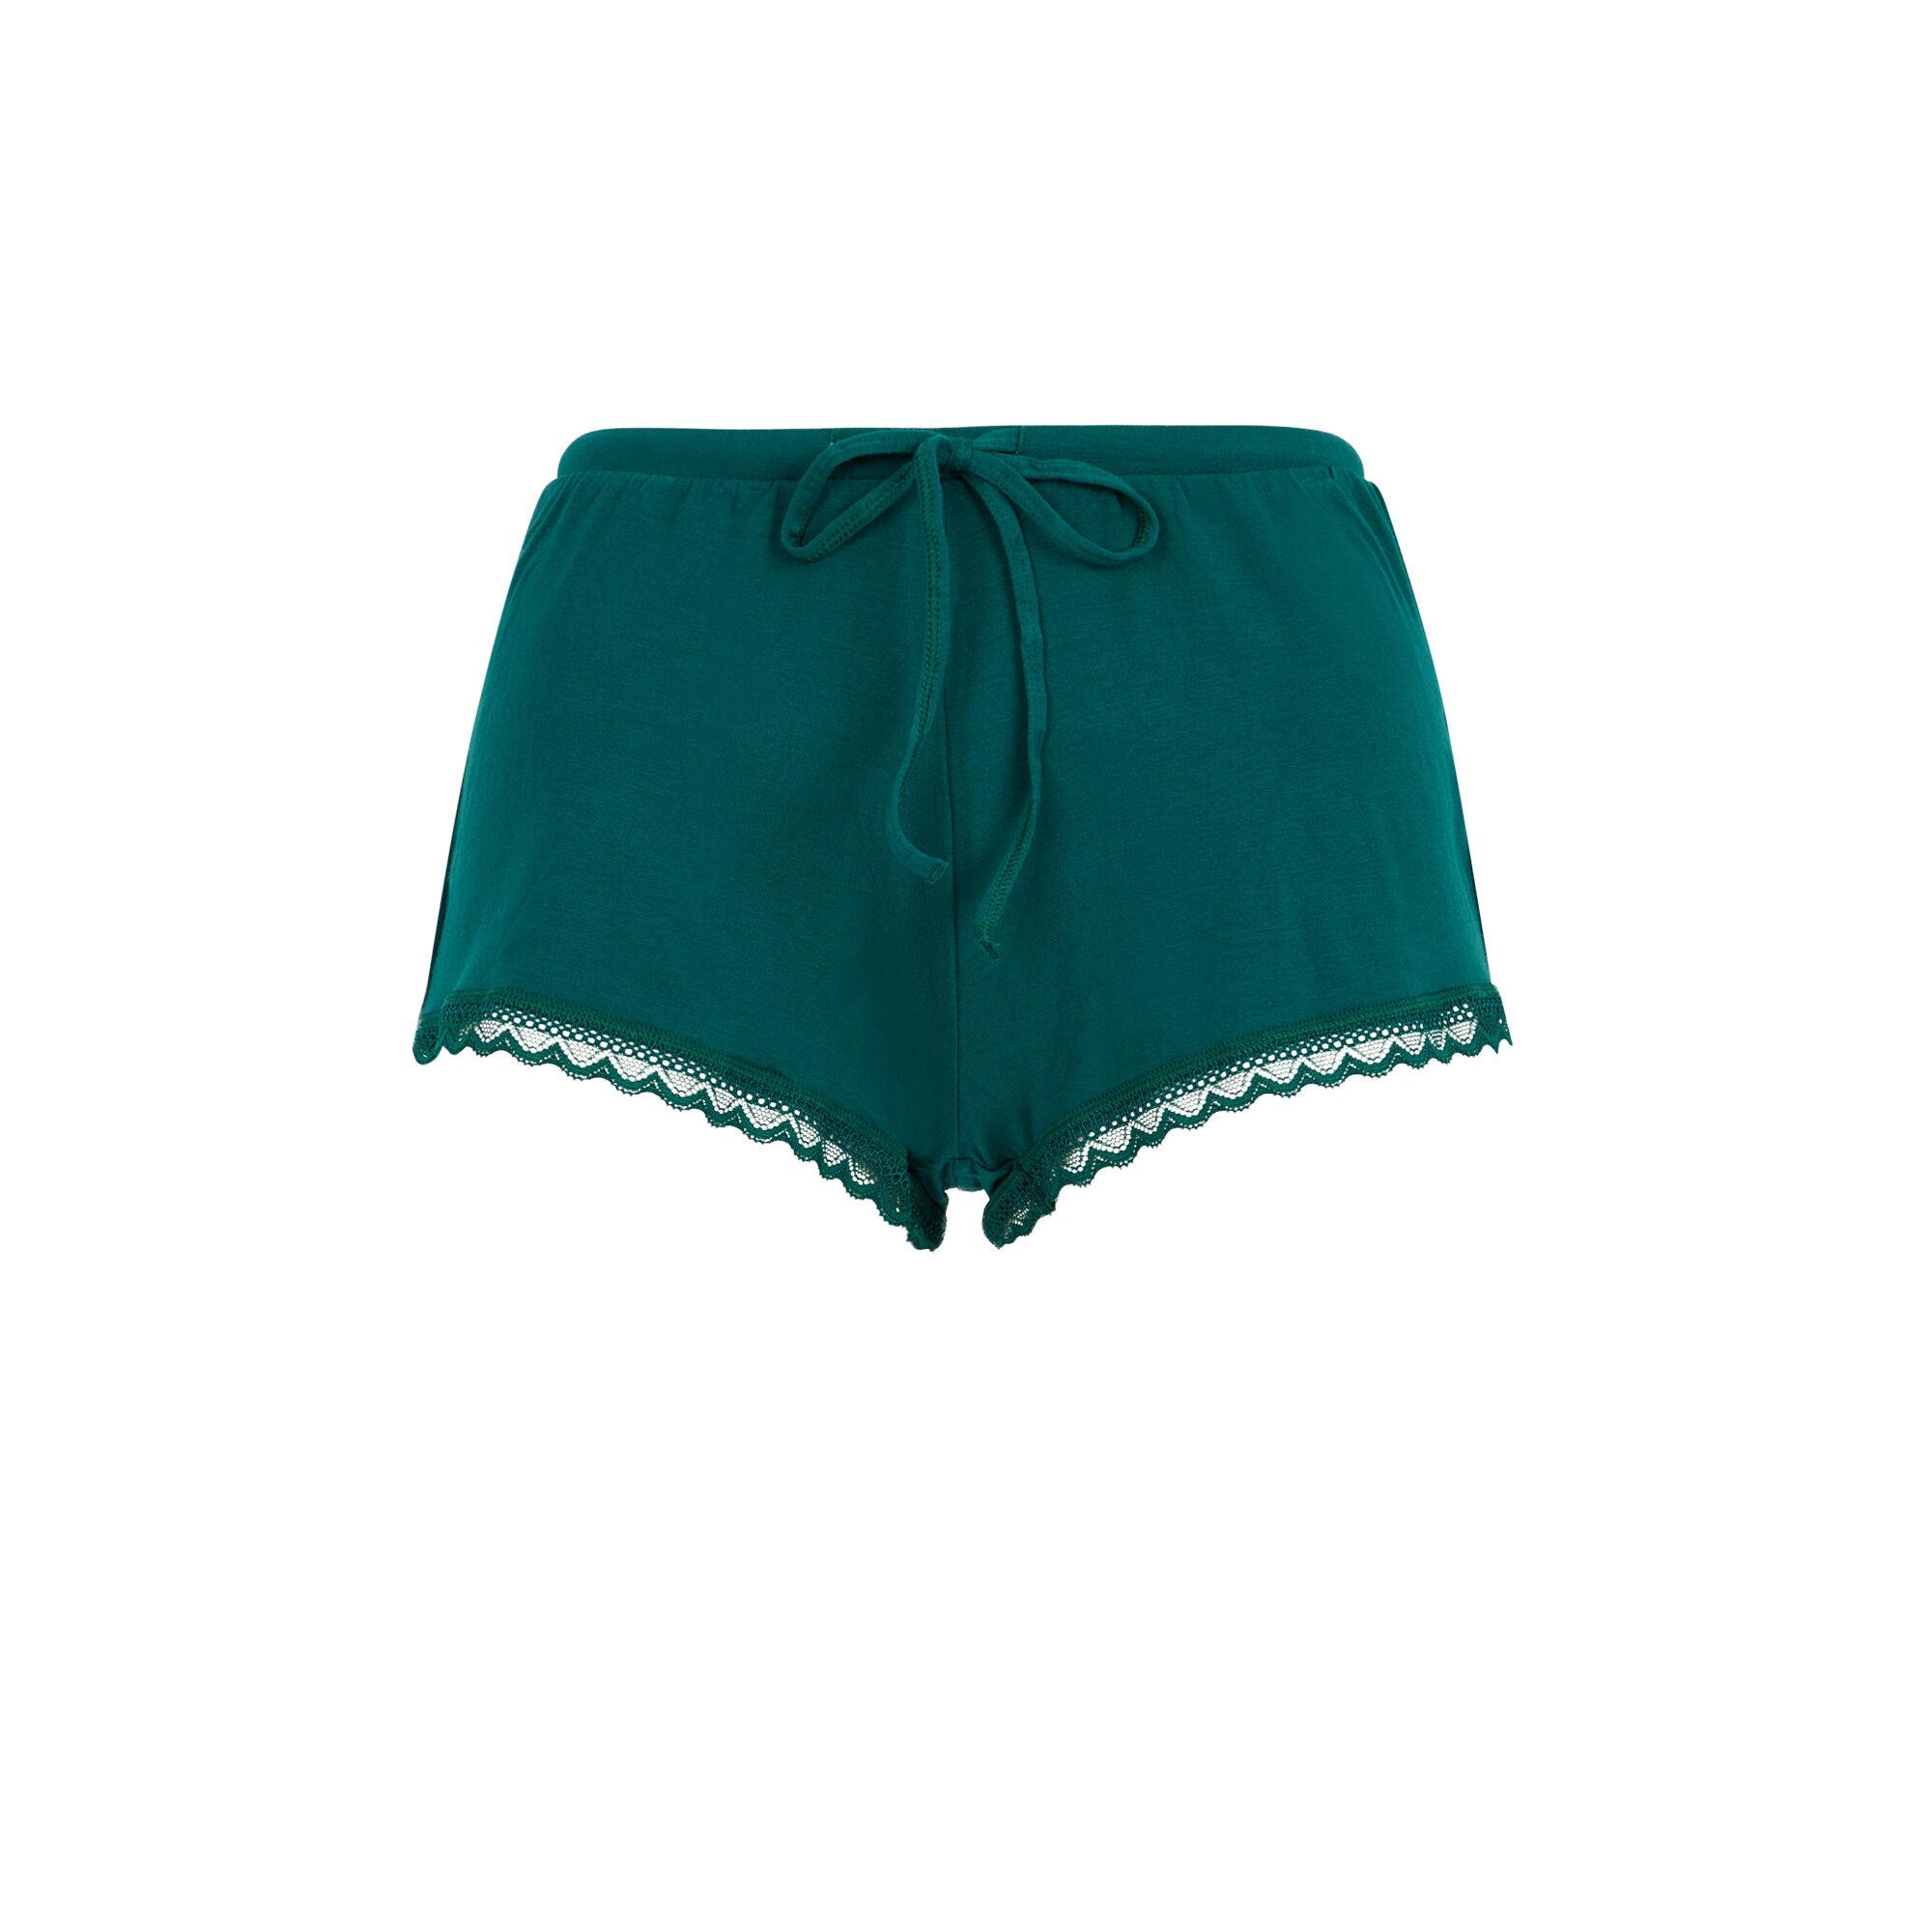 Vitamiz jersey shorts with lace yoke